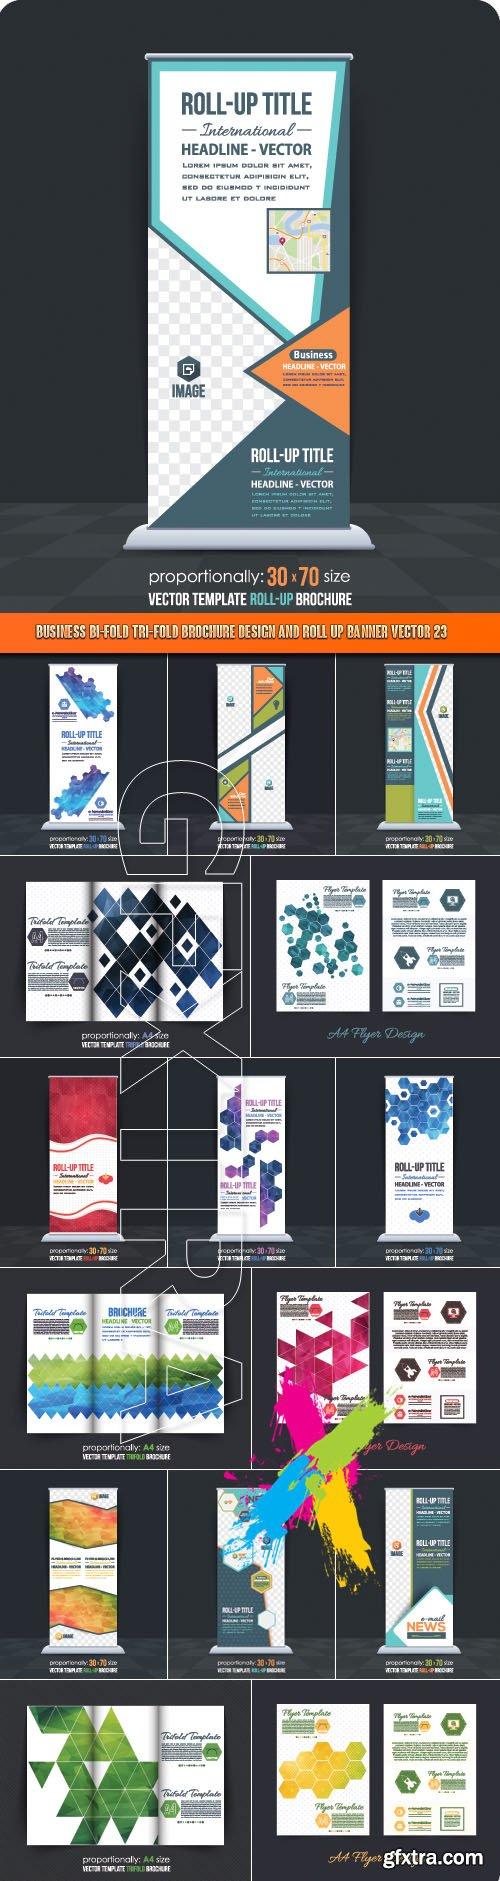 Business Bi-Fold Tri-Fold Brochure Design and Roll up banner vector 23